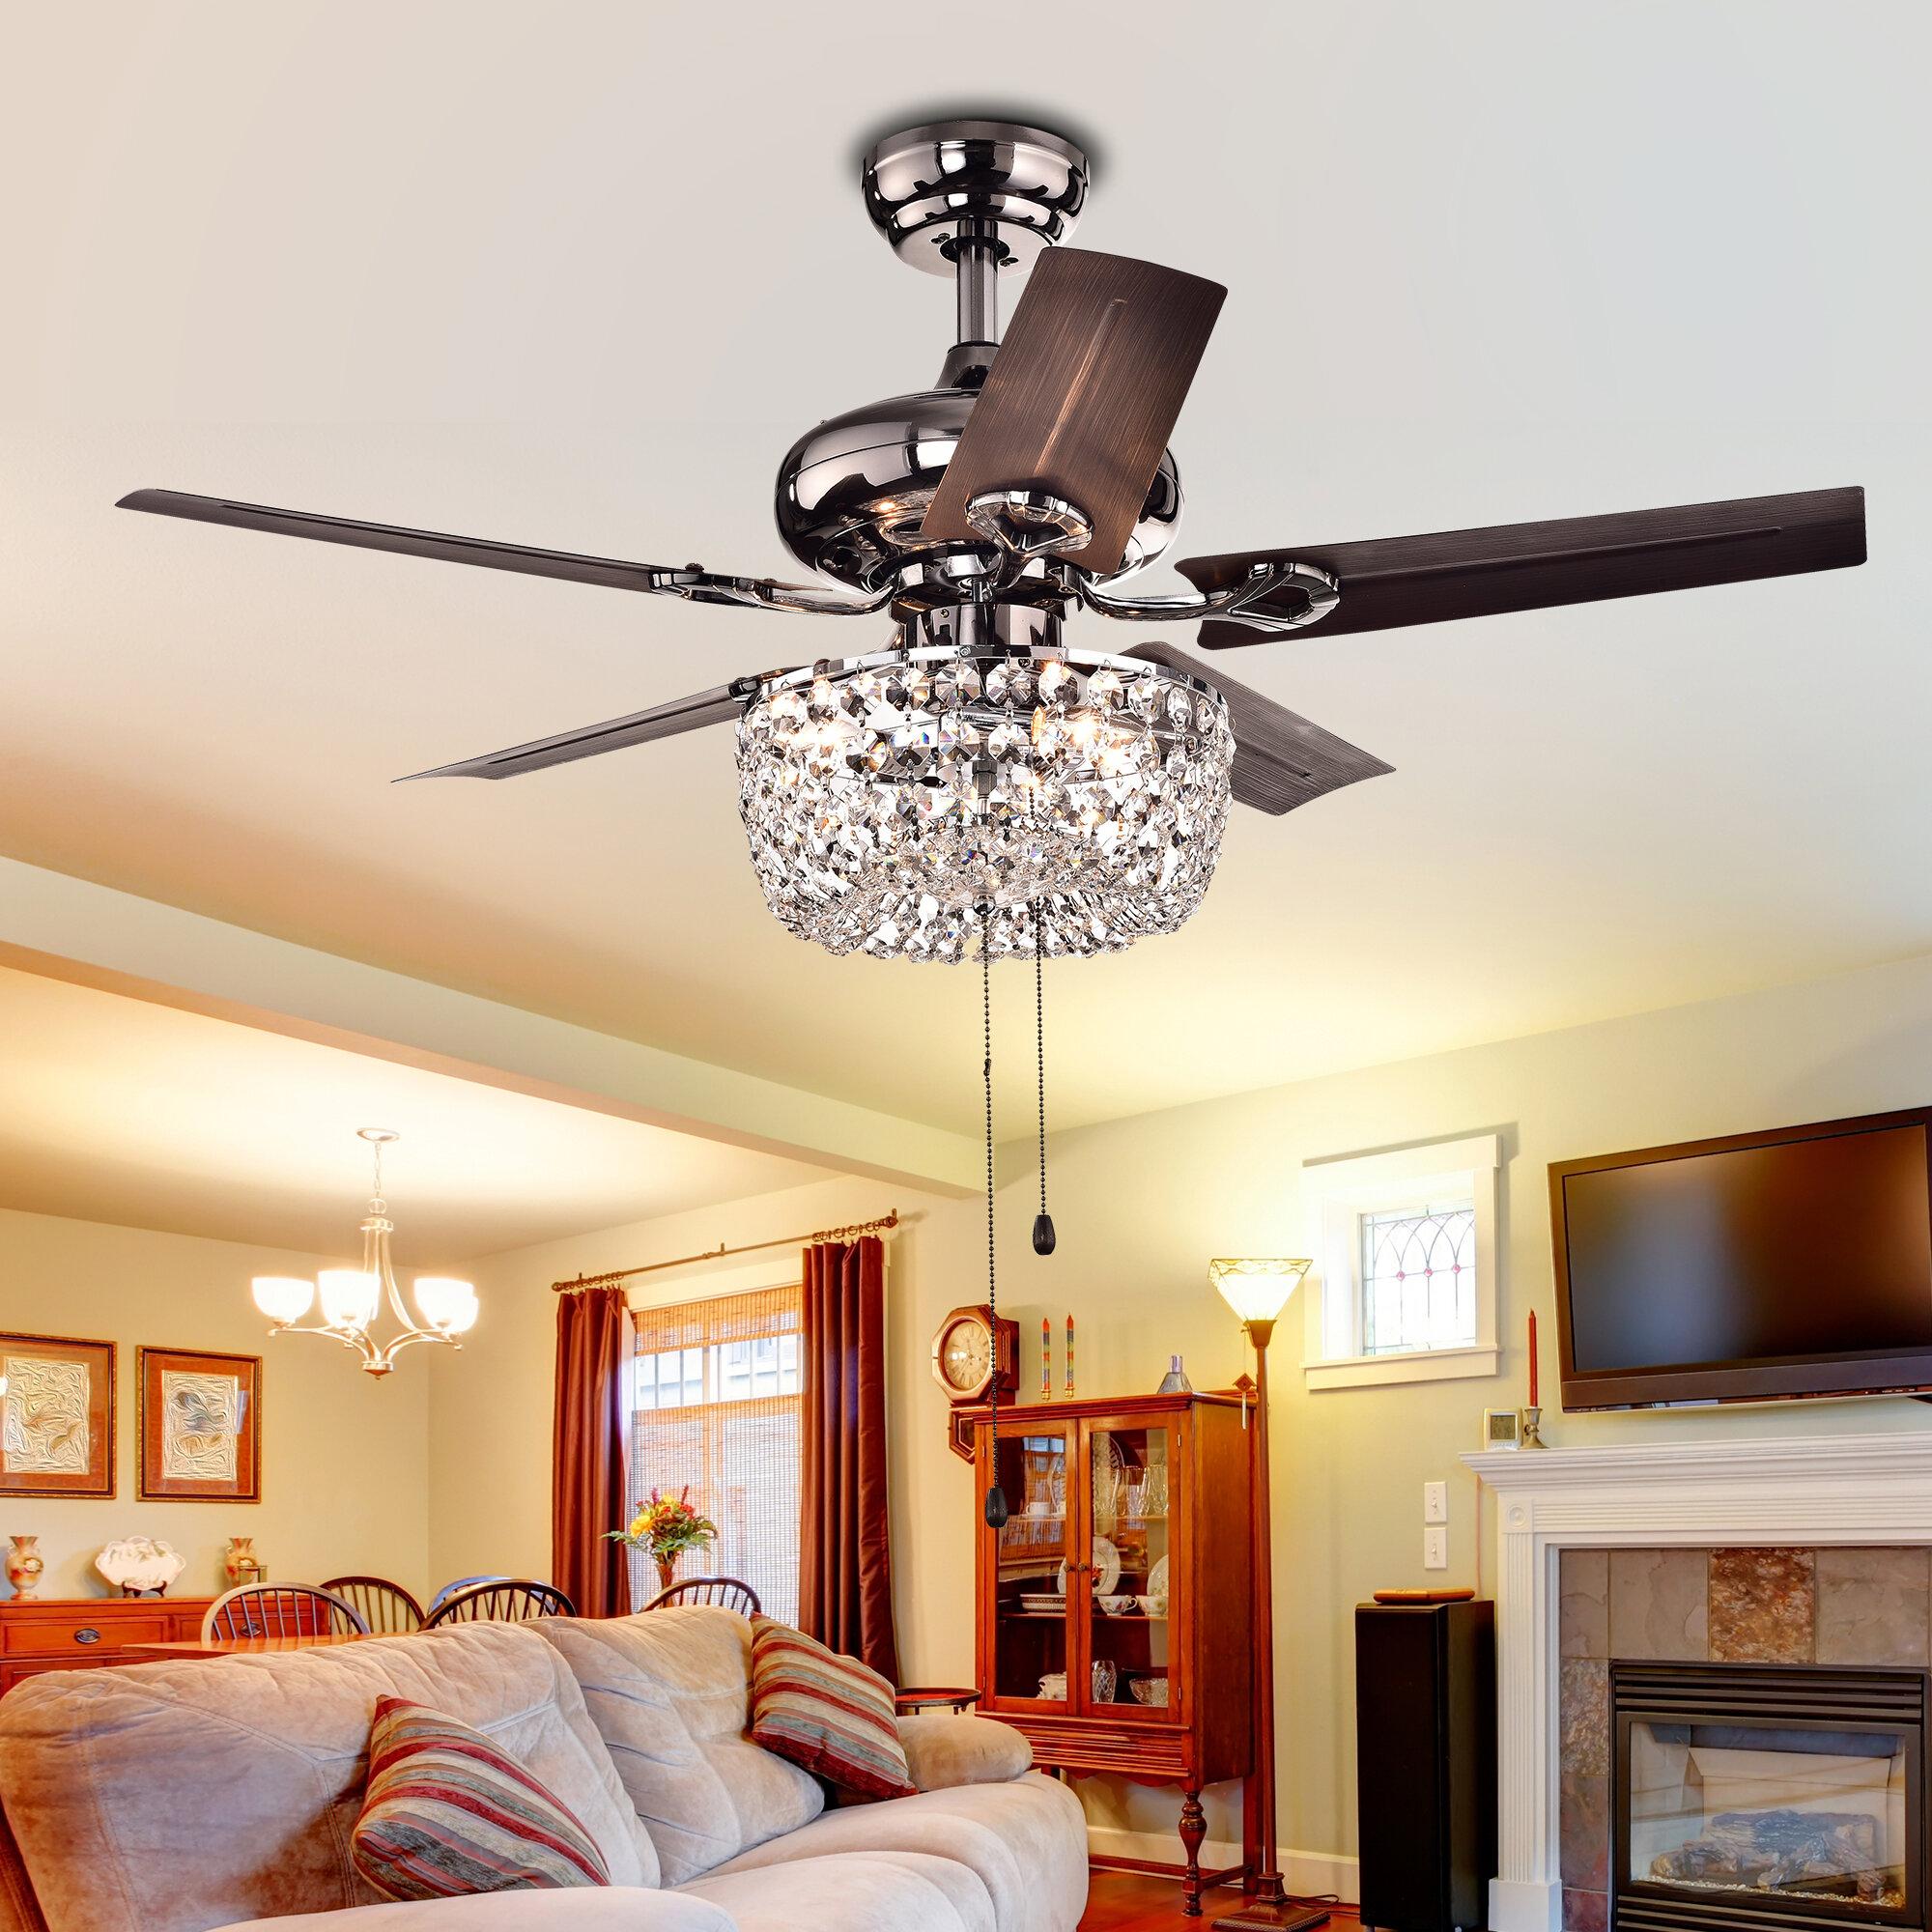 Astoria Grand Aslan 3 Light Bowl 5 Blade Ceiling Fan & Reviews